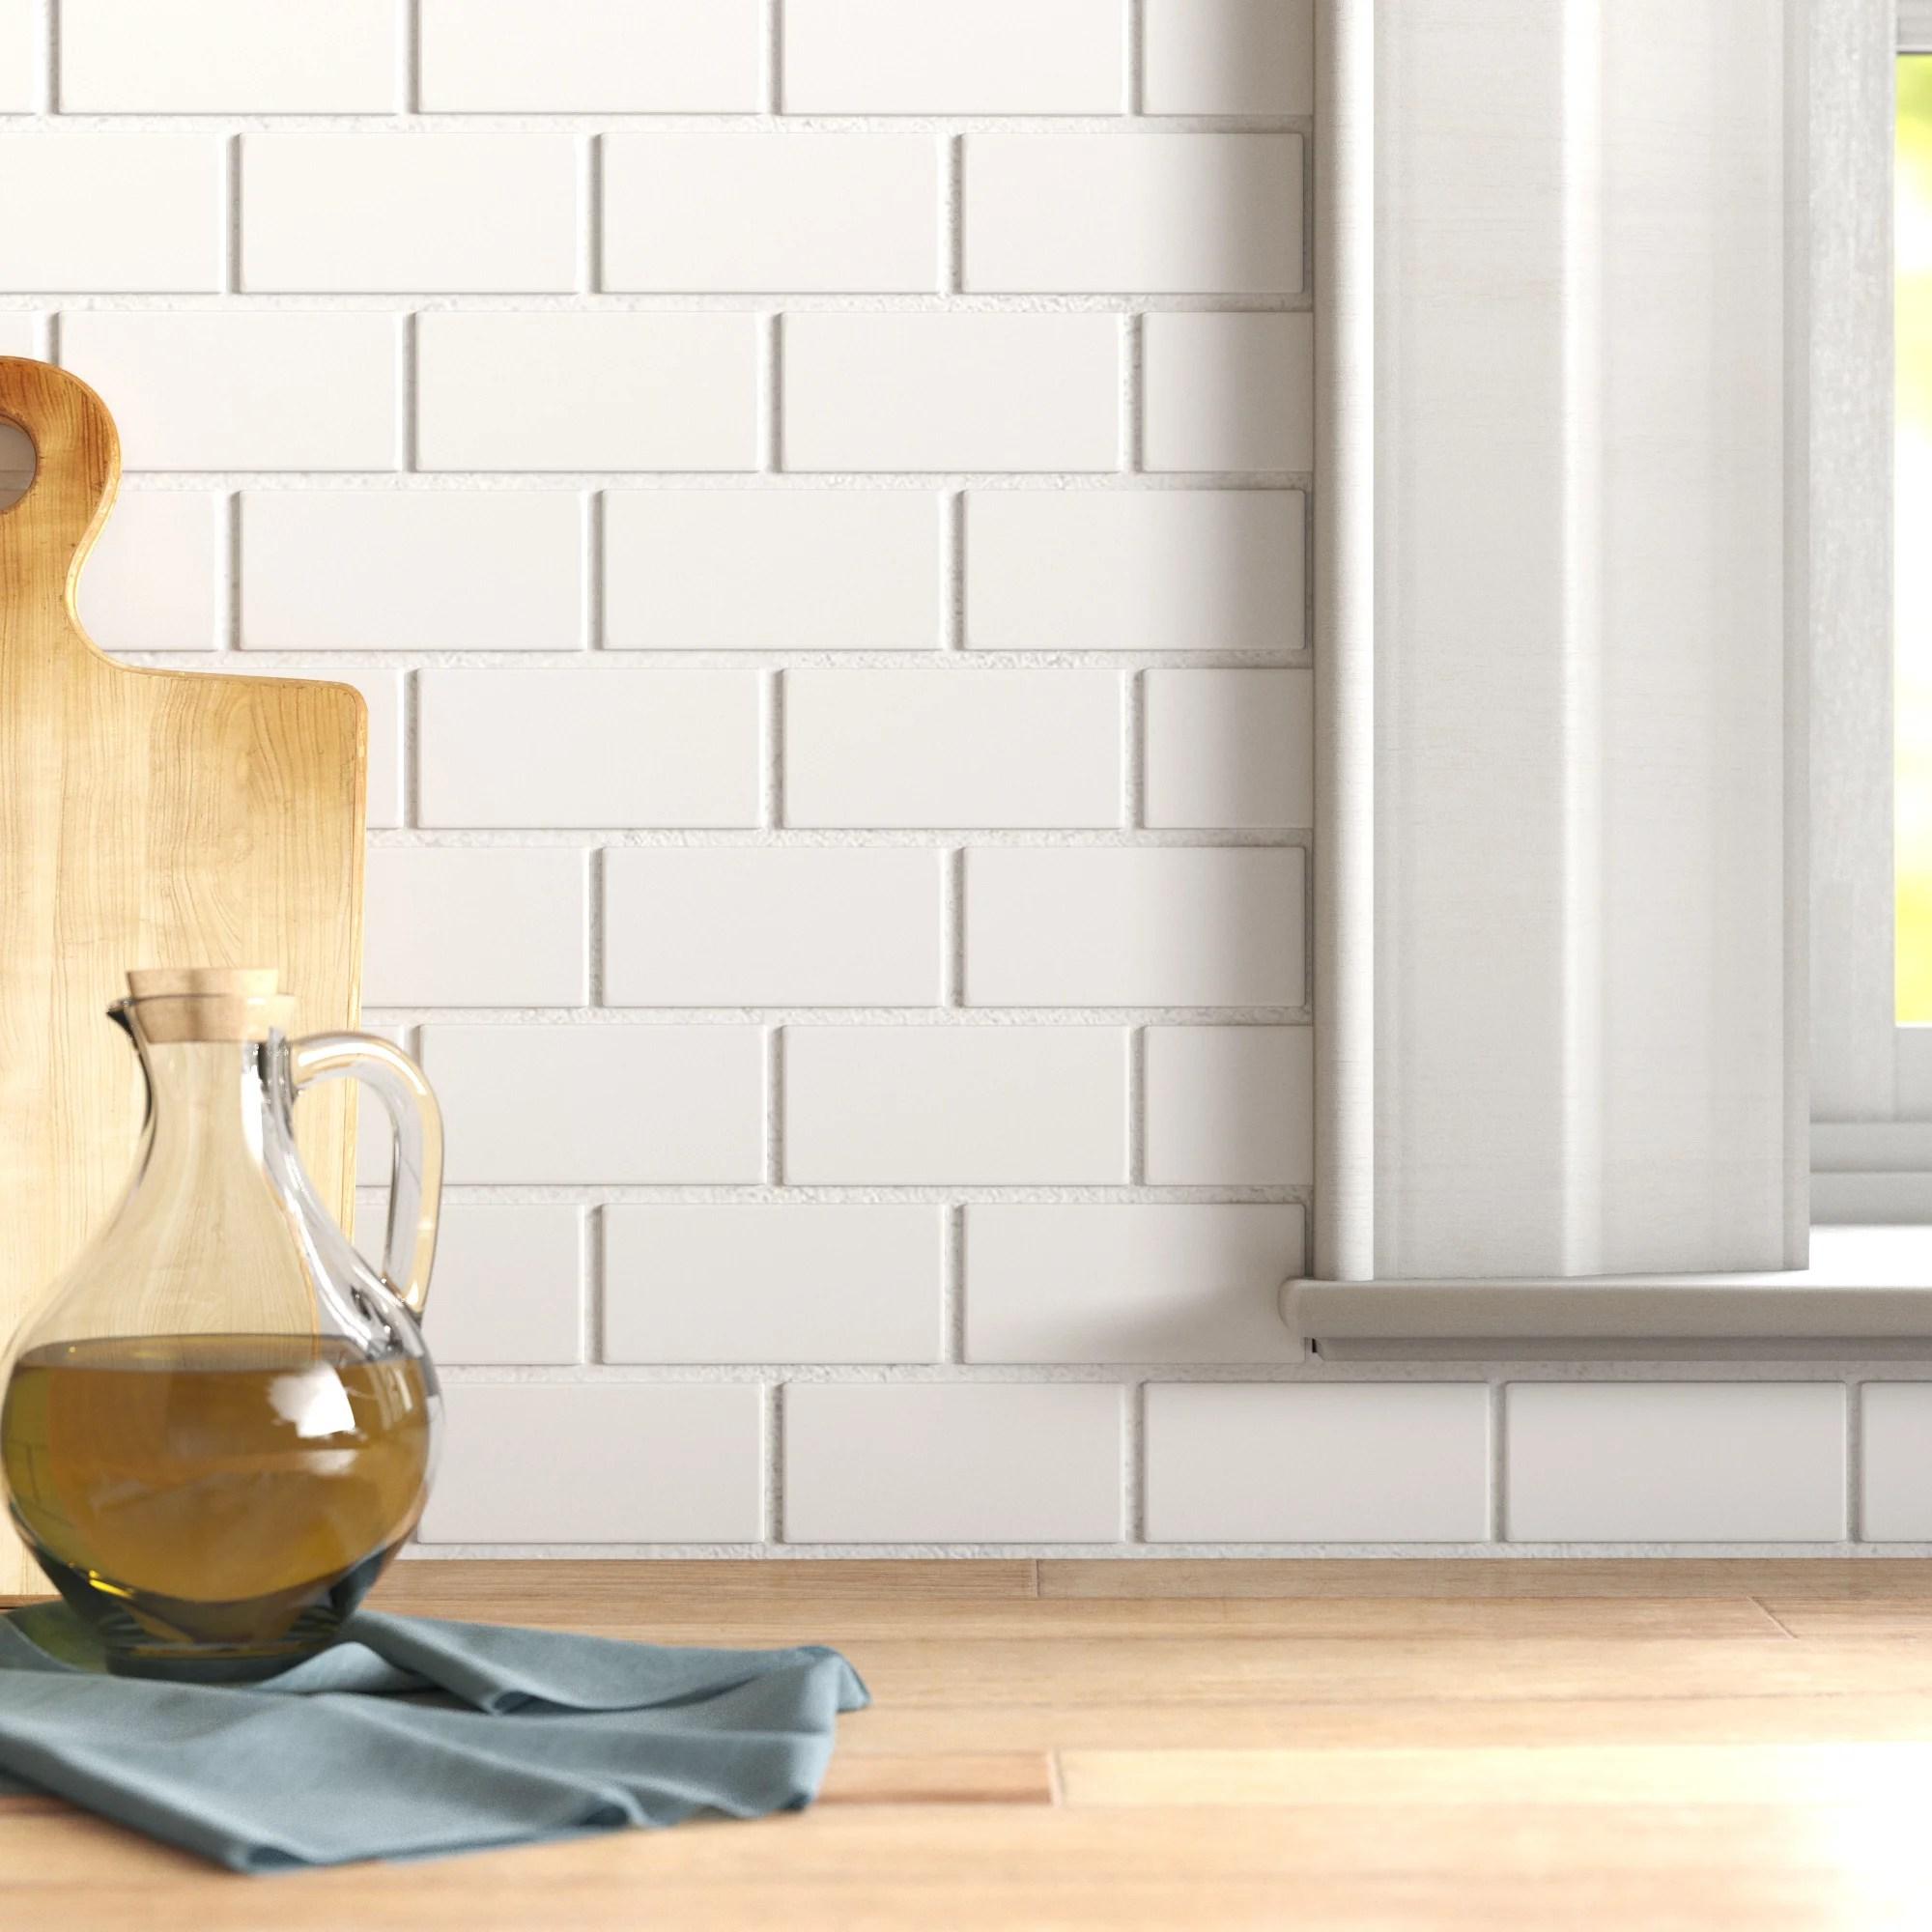 backsplash floor tiles wall tiles on